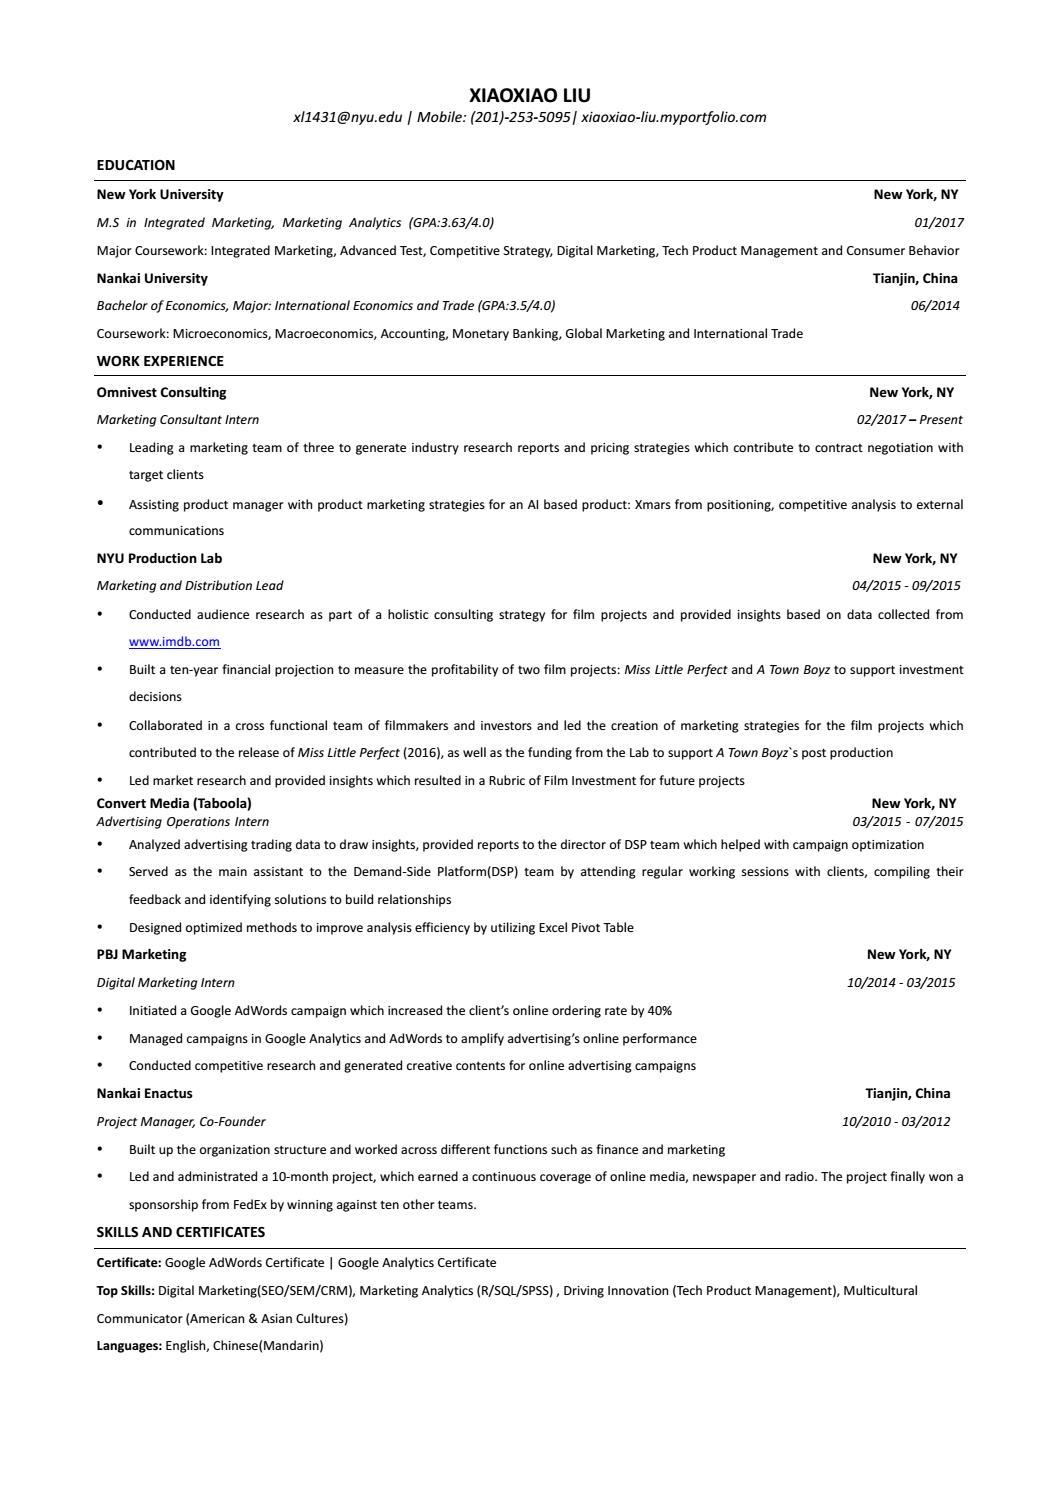 Xiaoxiaoliu Resume By New York Univeristy Issuu